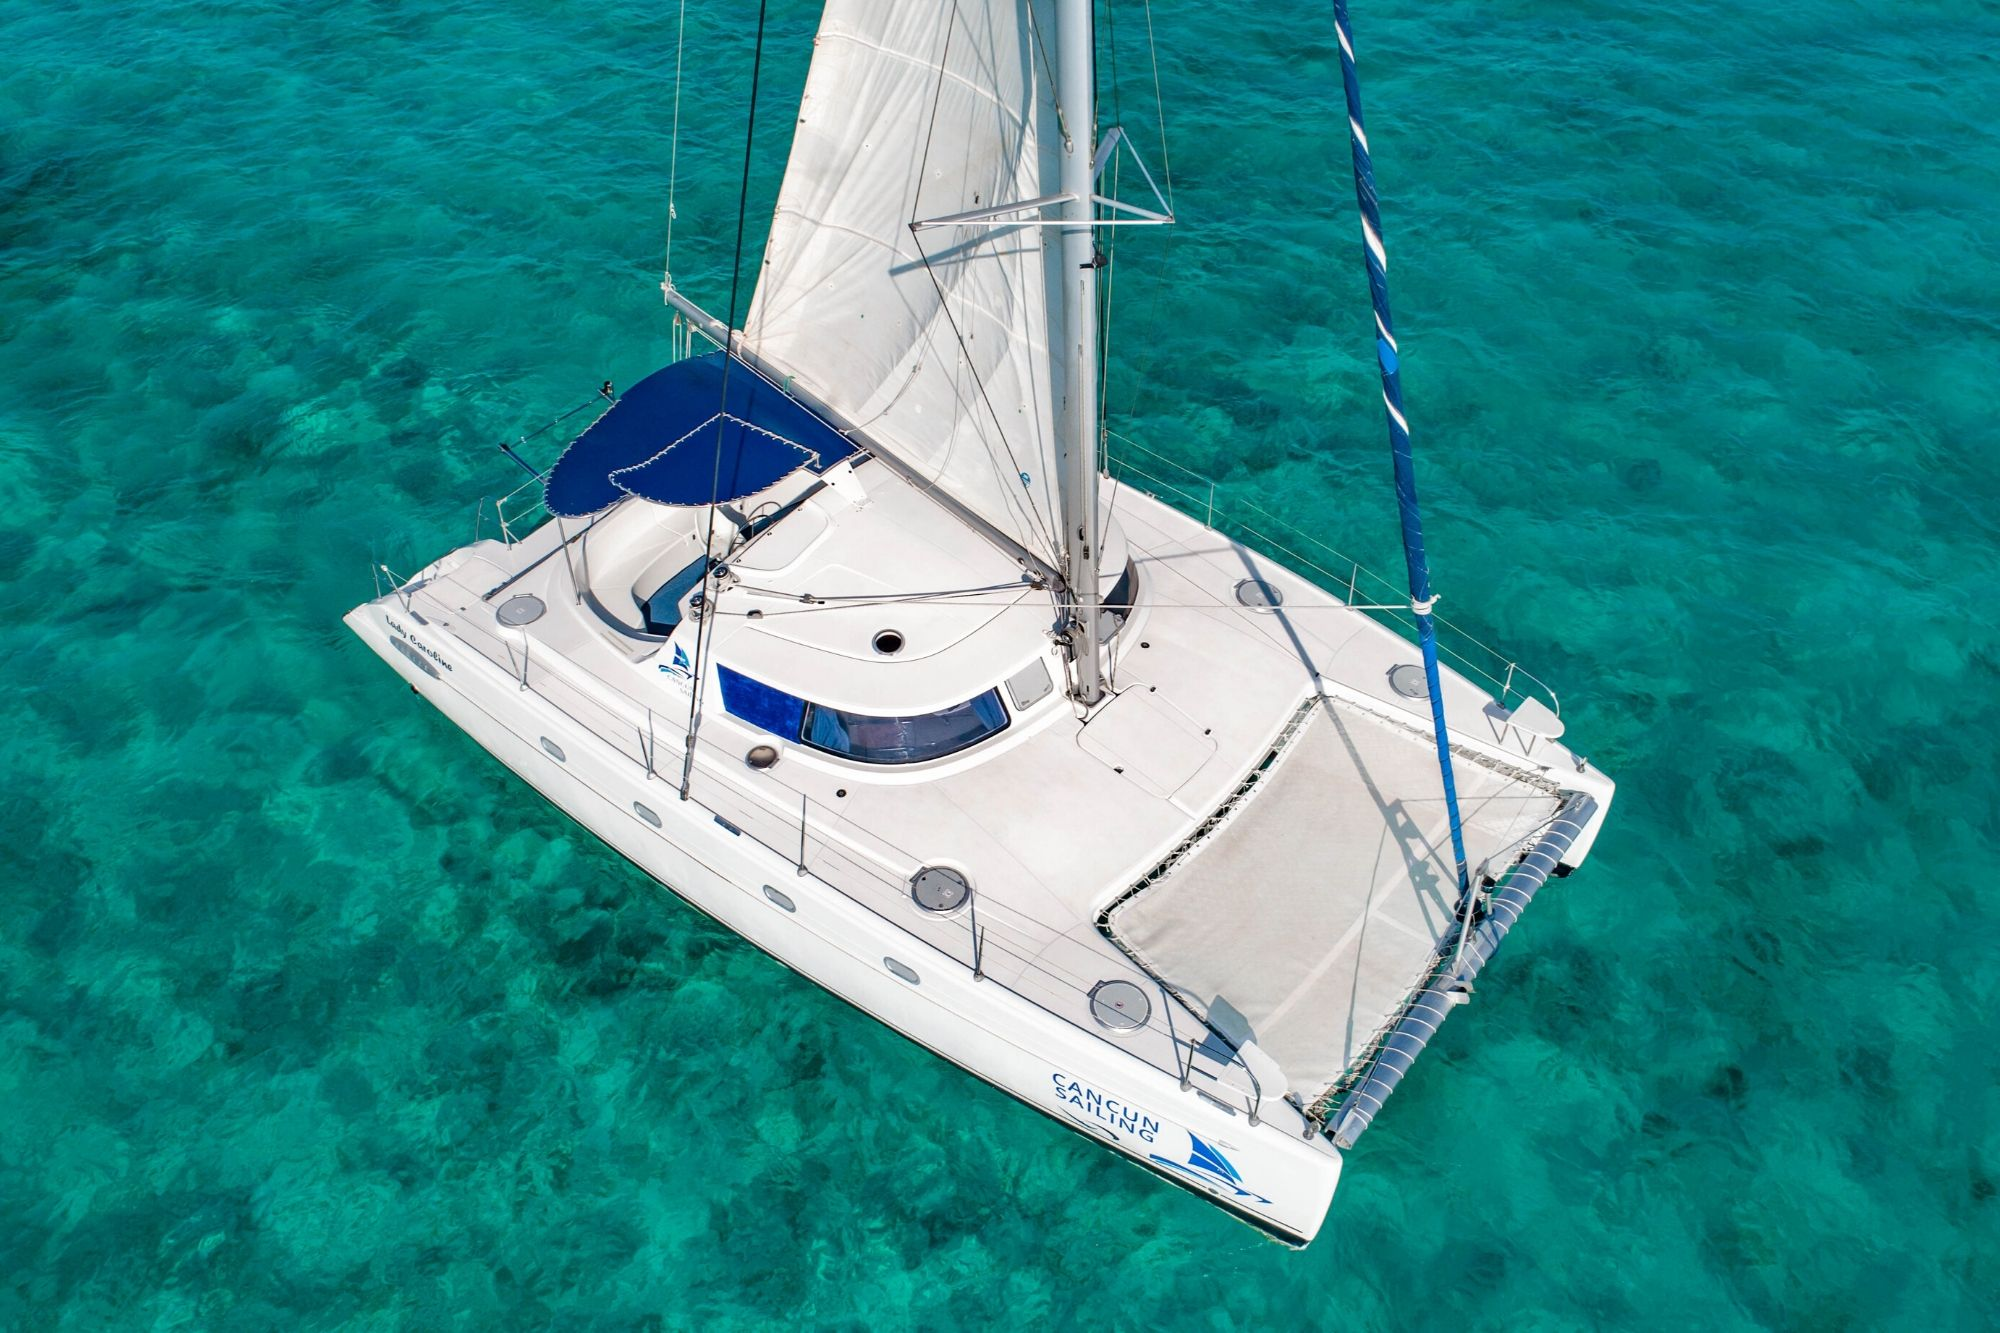 Lady Caroline - Isla Mujeres Catamaran Tour - Cancun Sailing - 3